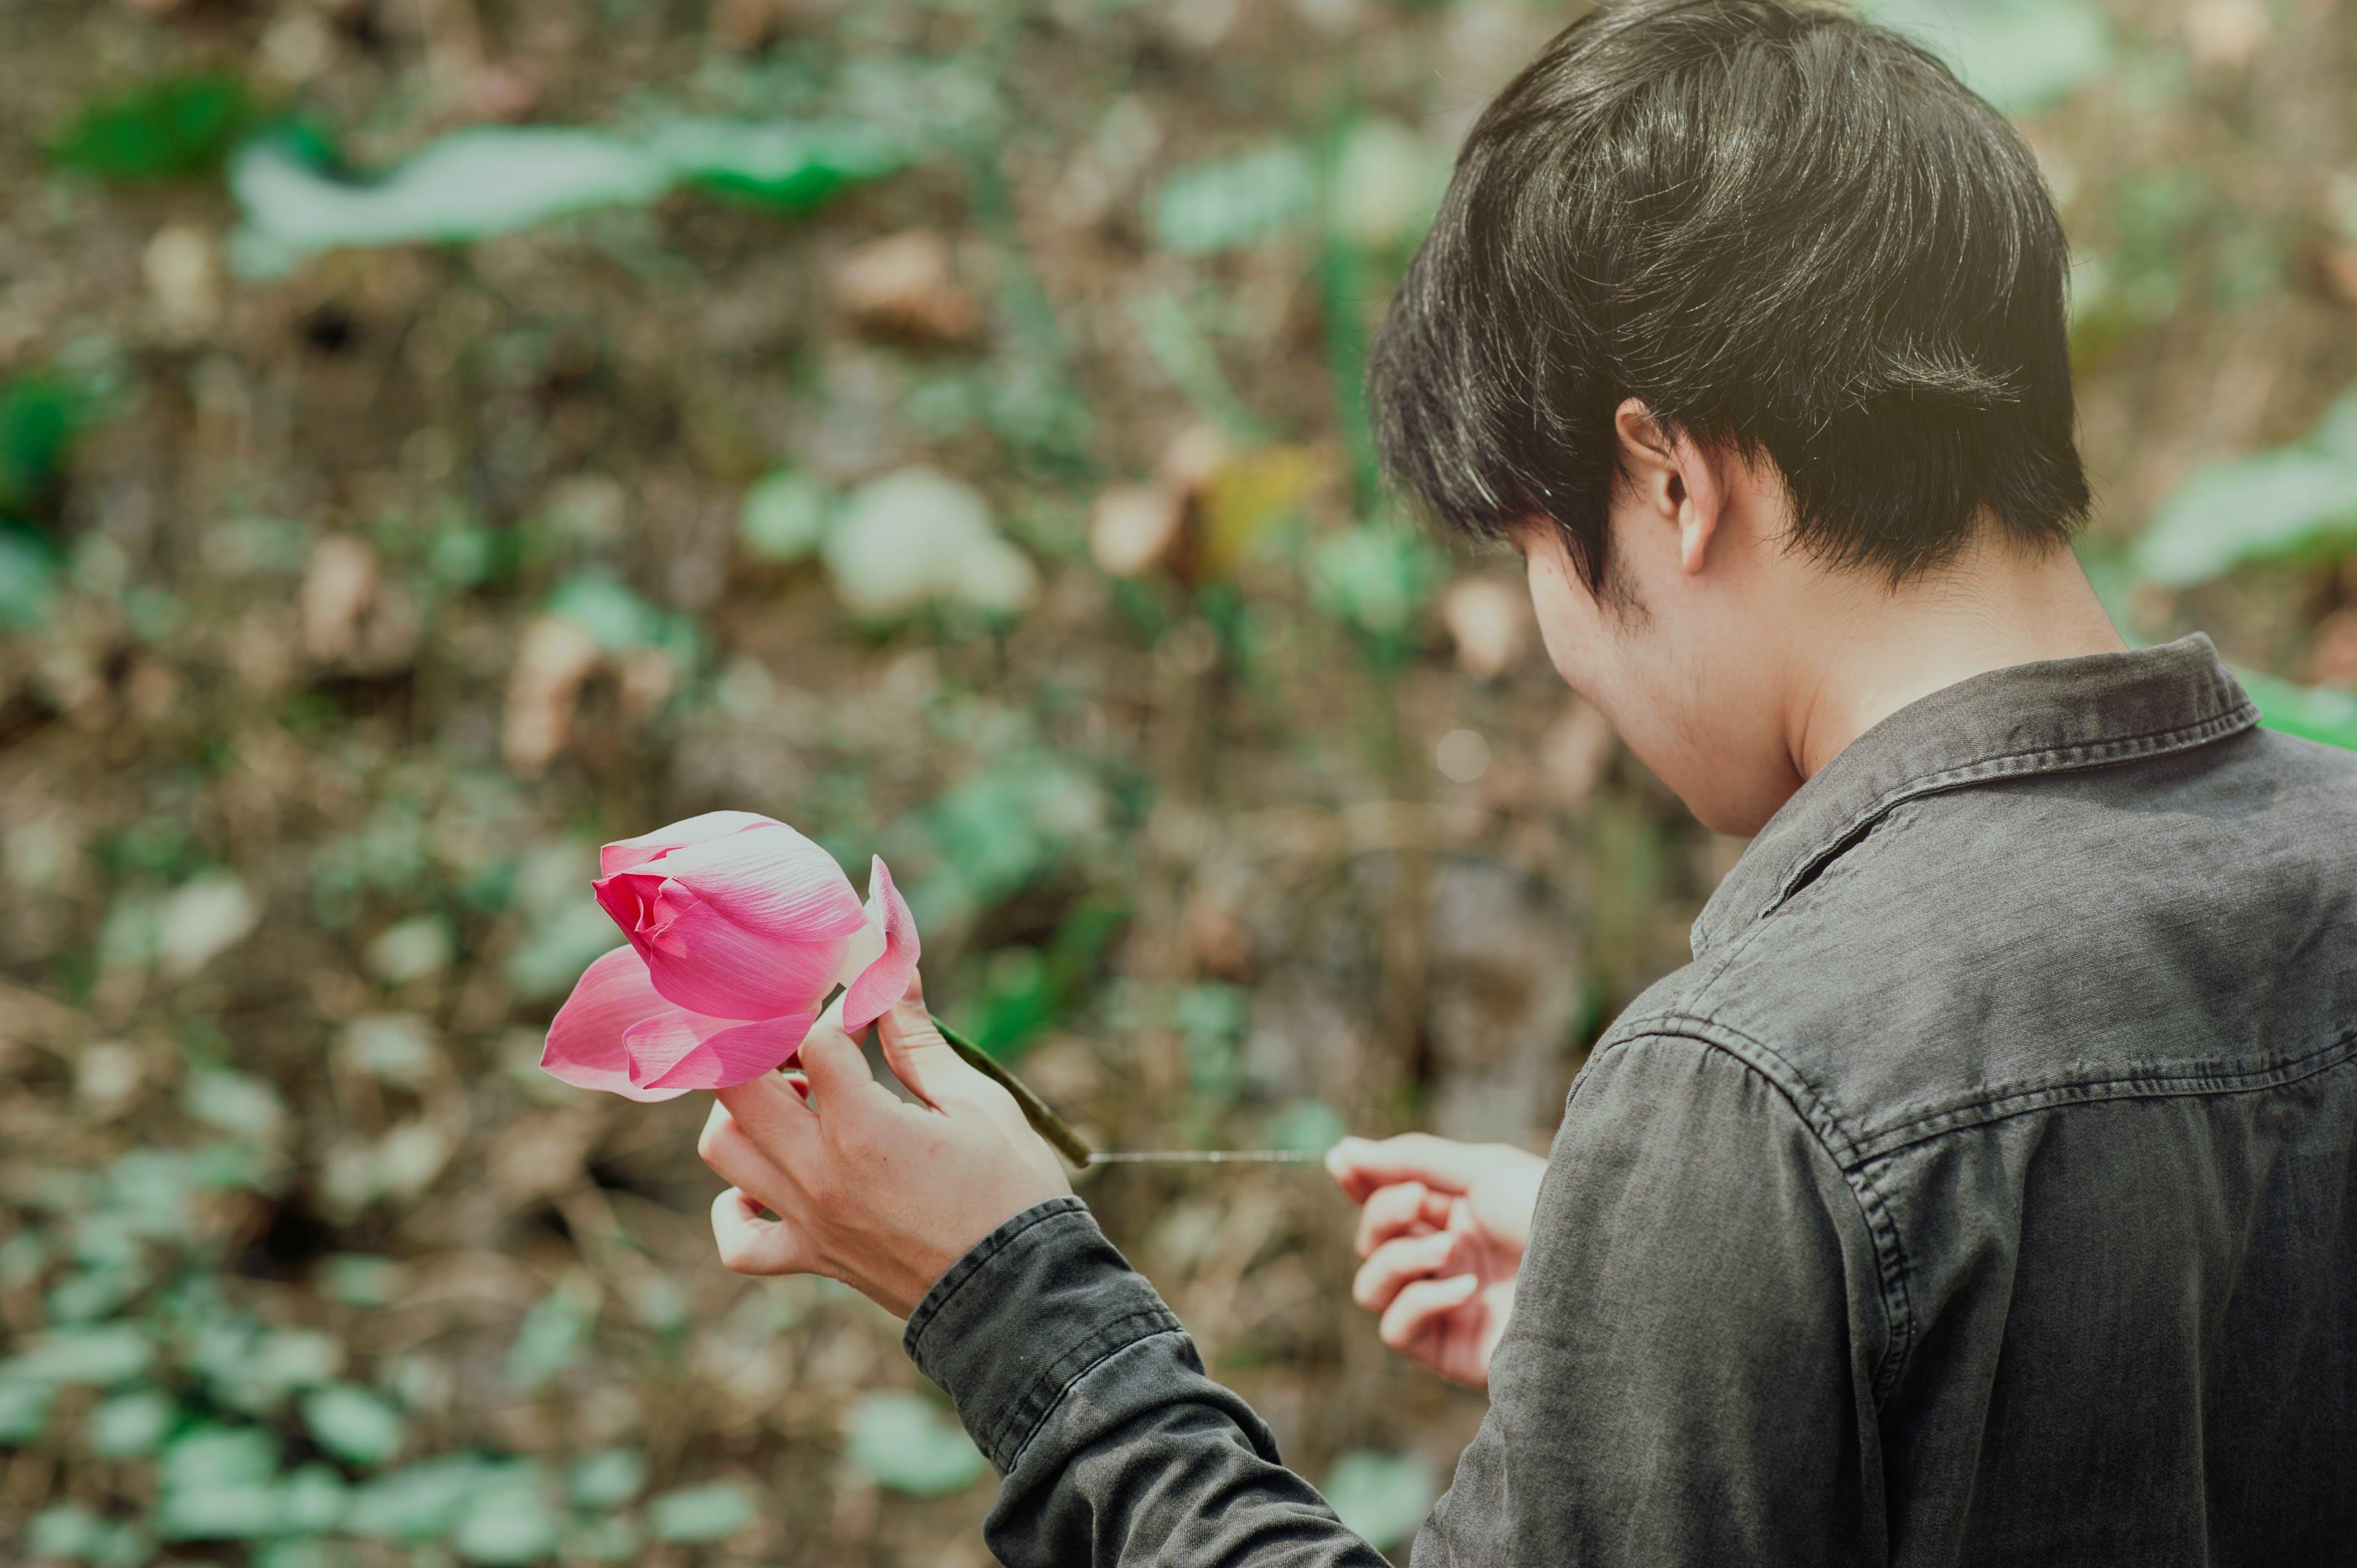 Man in Black Denim Jean Holding Pink Flower